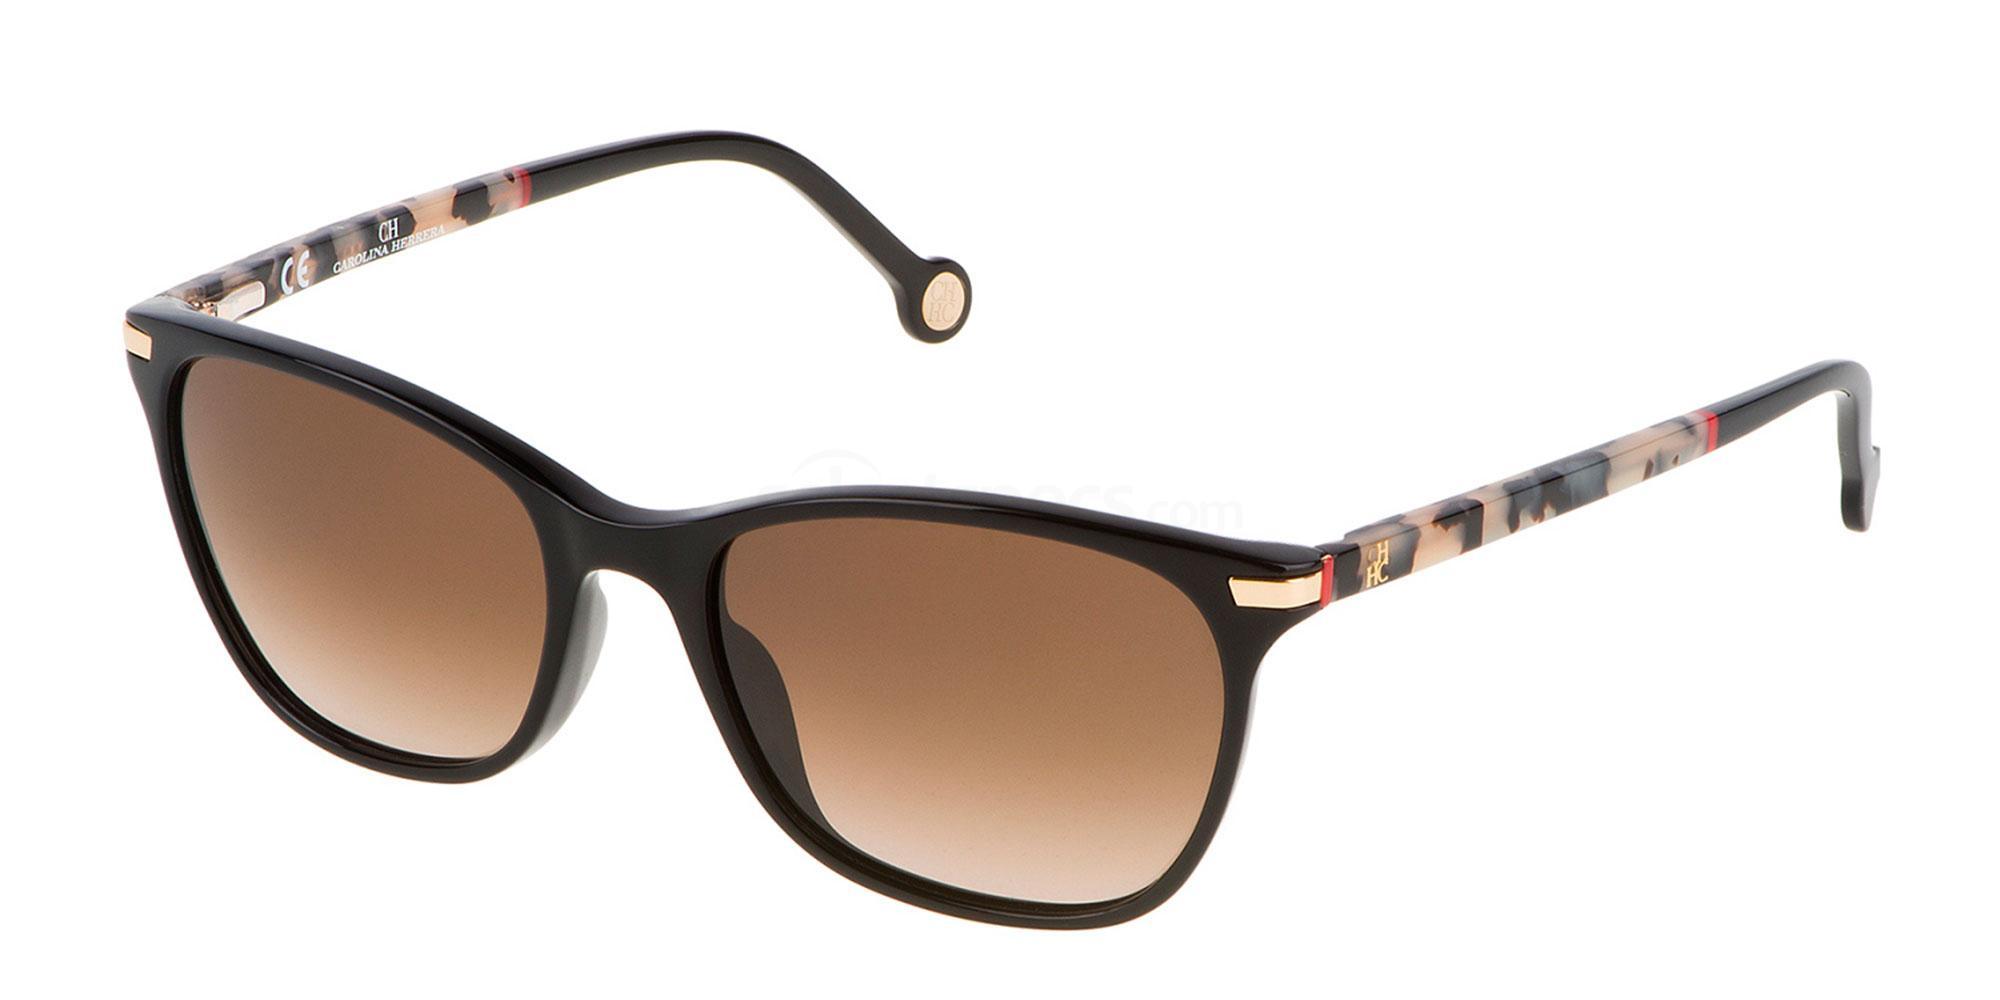 0700 SHE652V Sunglasses, CH Carolina Herrera